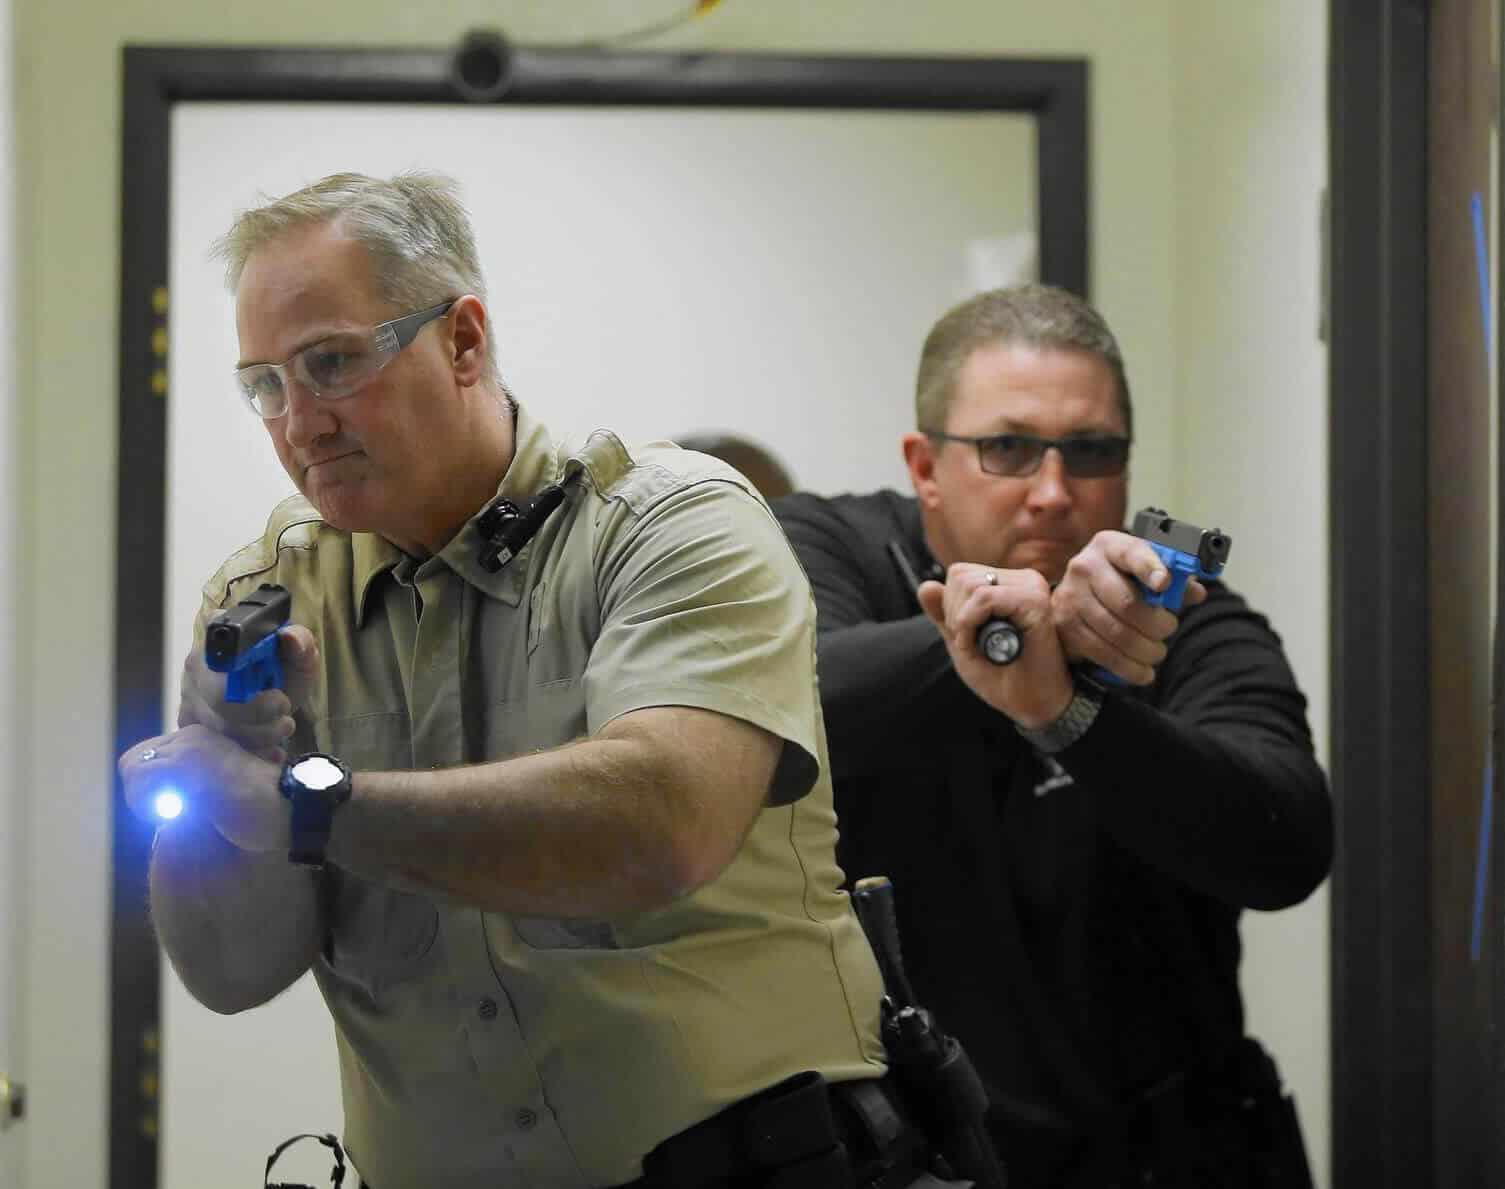 Police de-escalation training response system